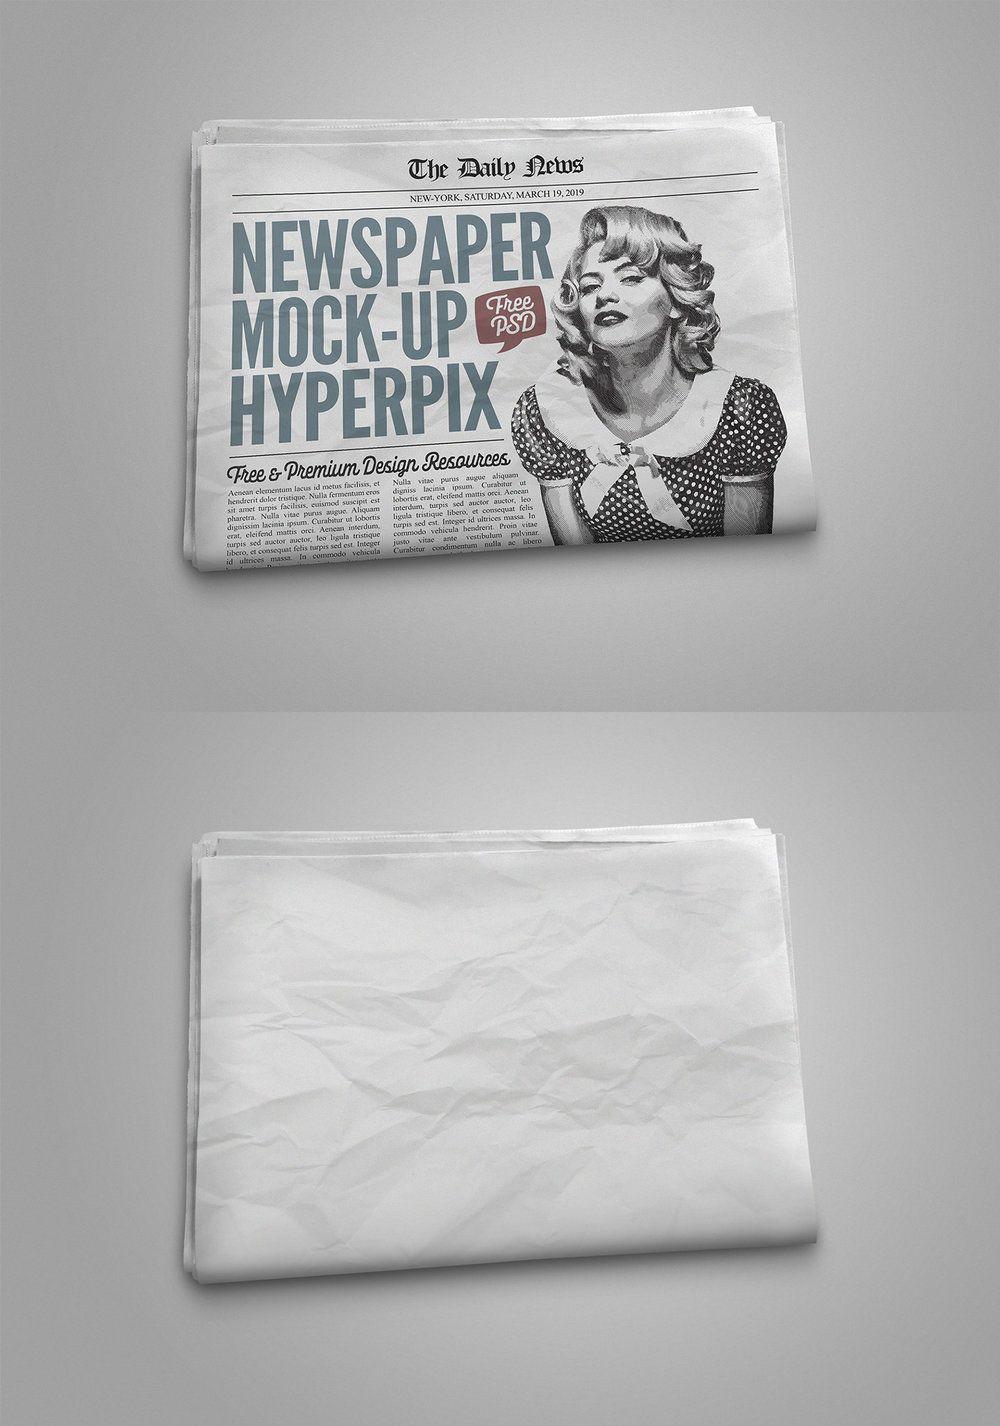 Download Free Photorealistic Newspaper Mockup Pixel Surplus Resources For Creators Graphic Design Mockup Free Mockup Free Graphic Design